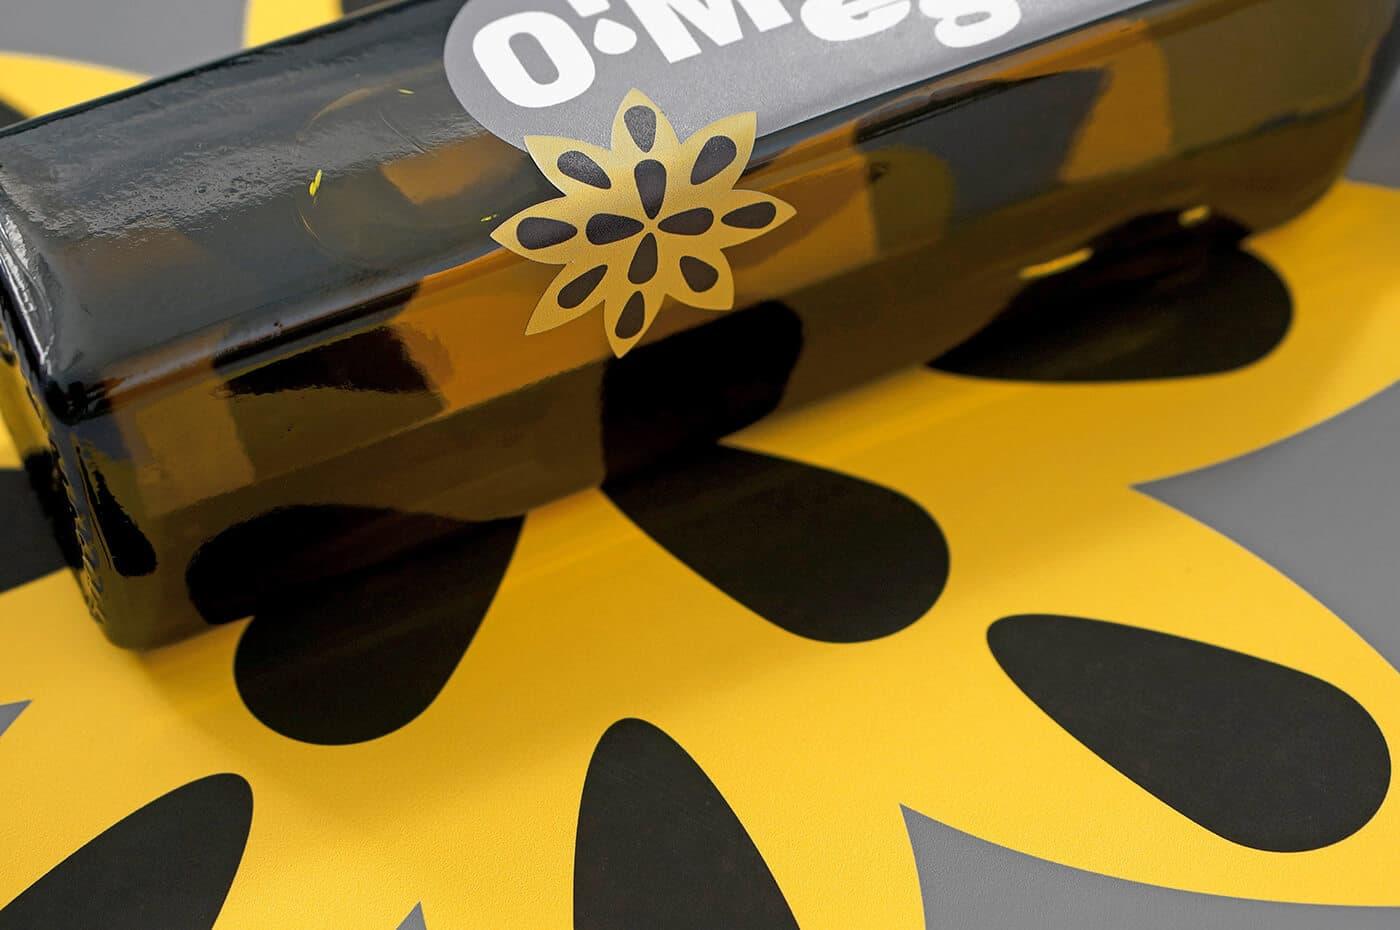 O!Meega - ID and Package Design